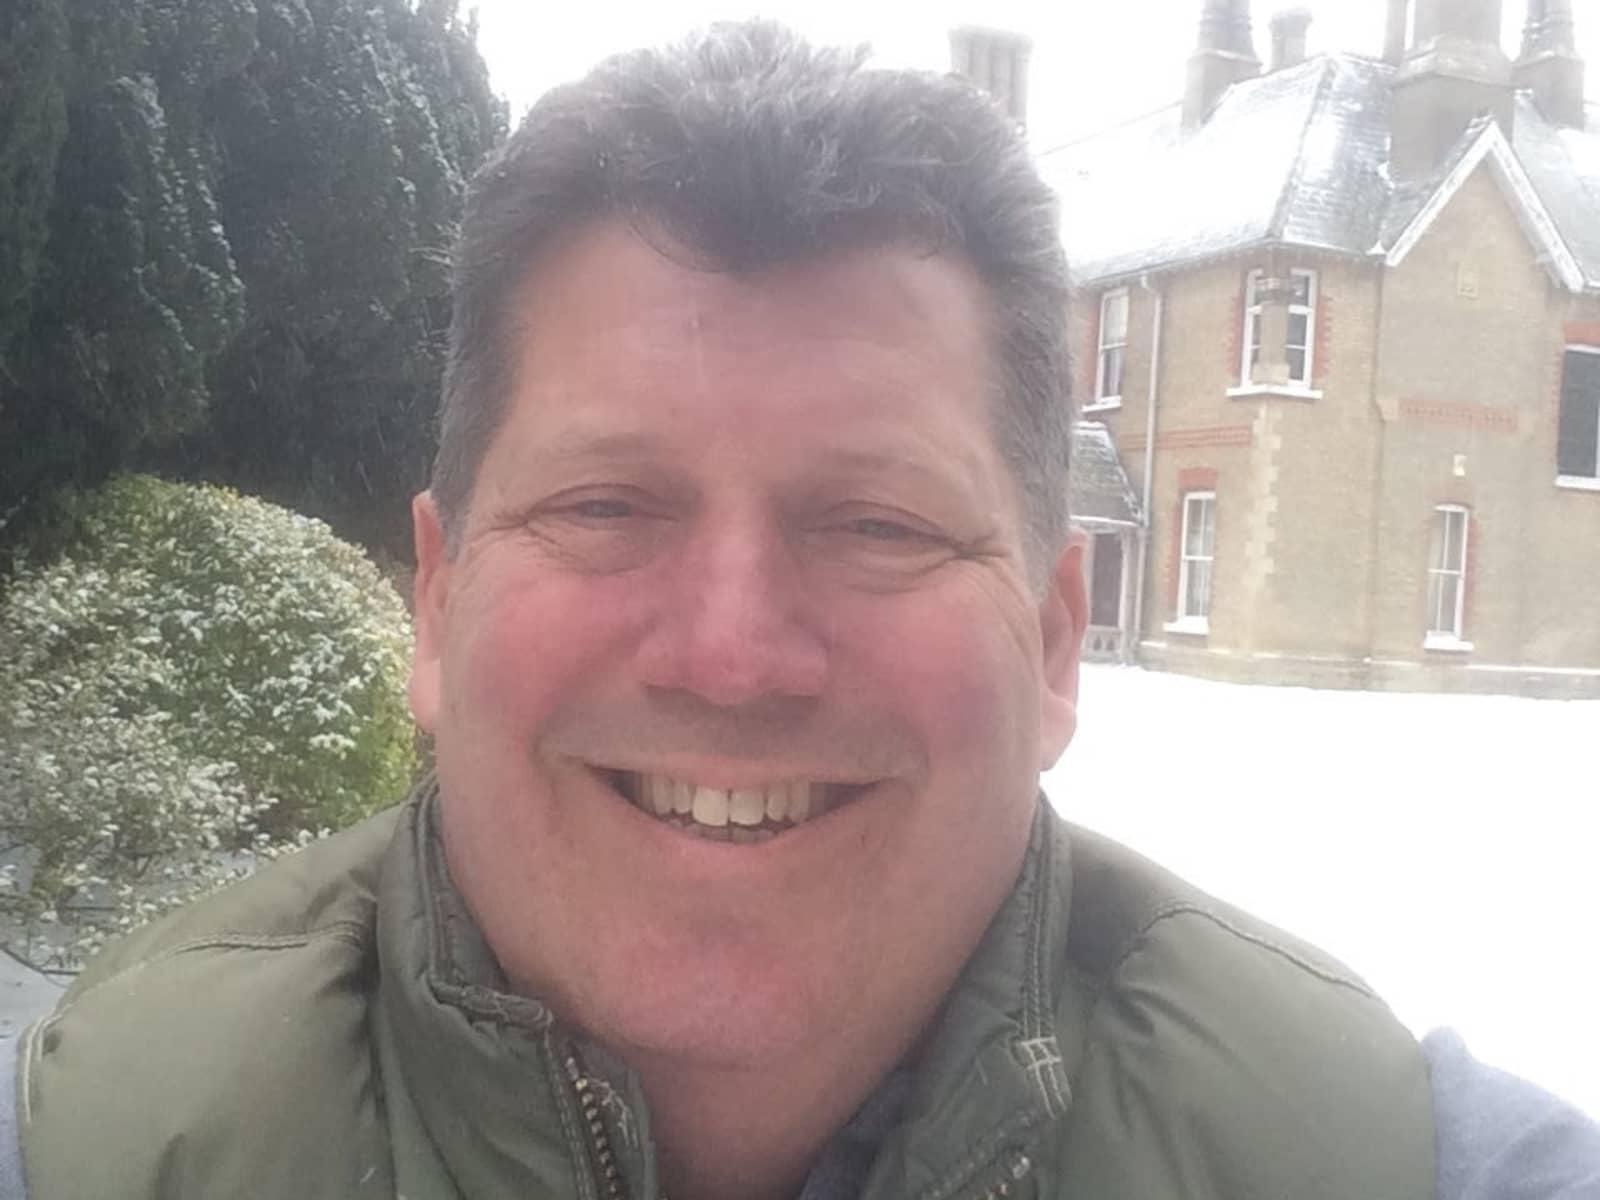 James from Saint Neots, United Kingdom